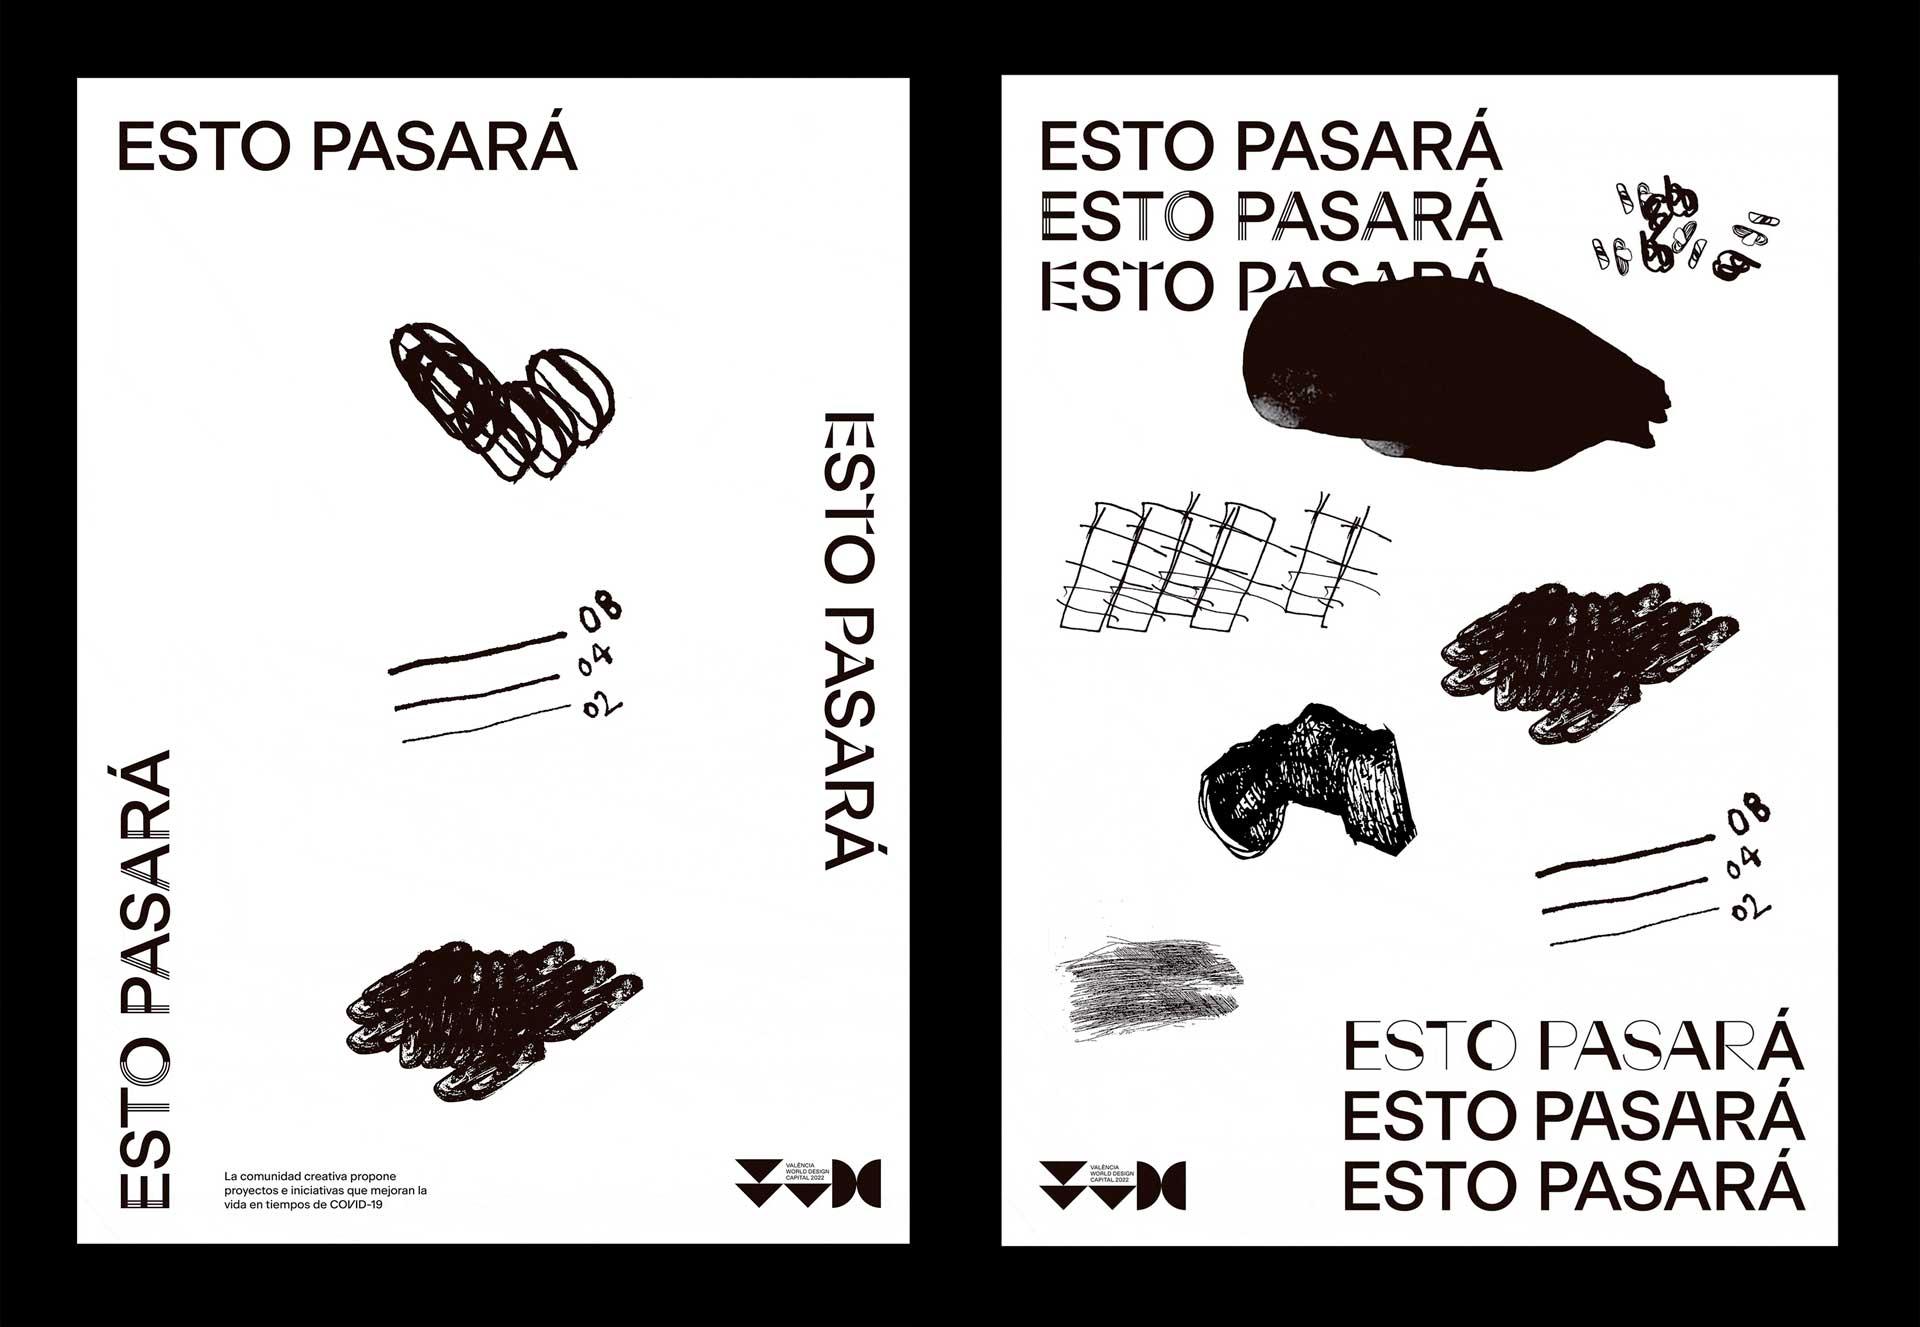 "#EstoPasará (""This too shall pass""), the creative platform"